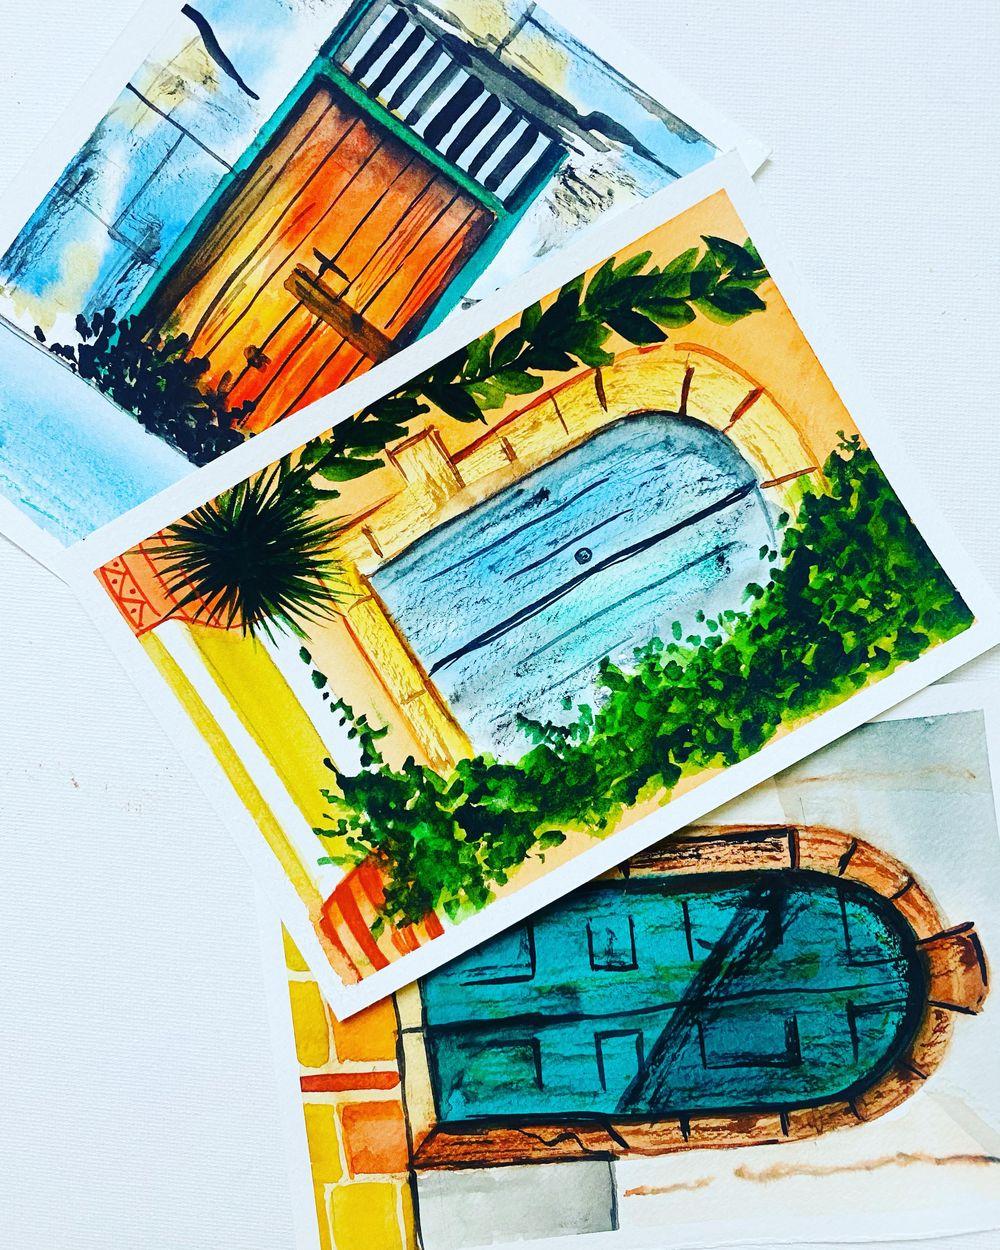 vintage doors - image 3 - student project